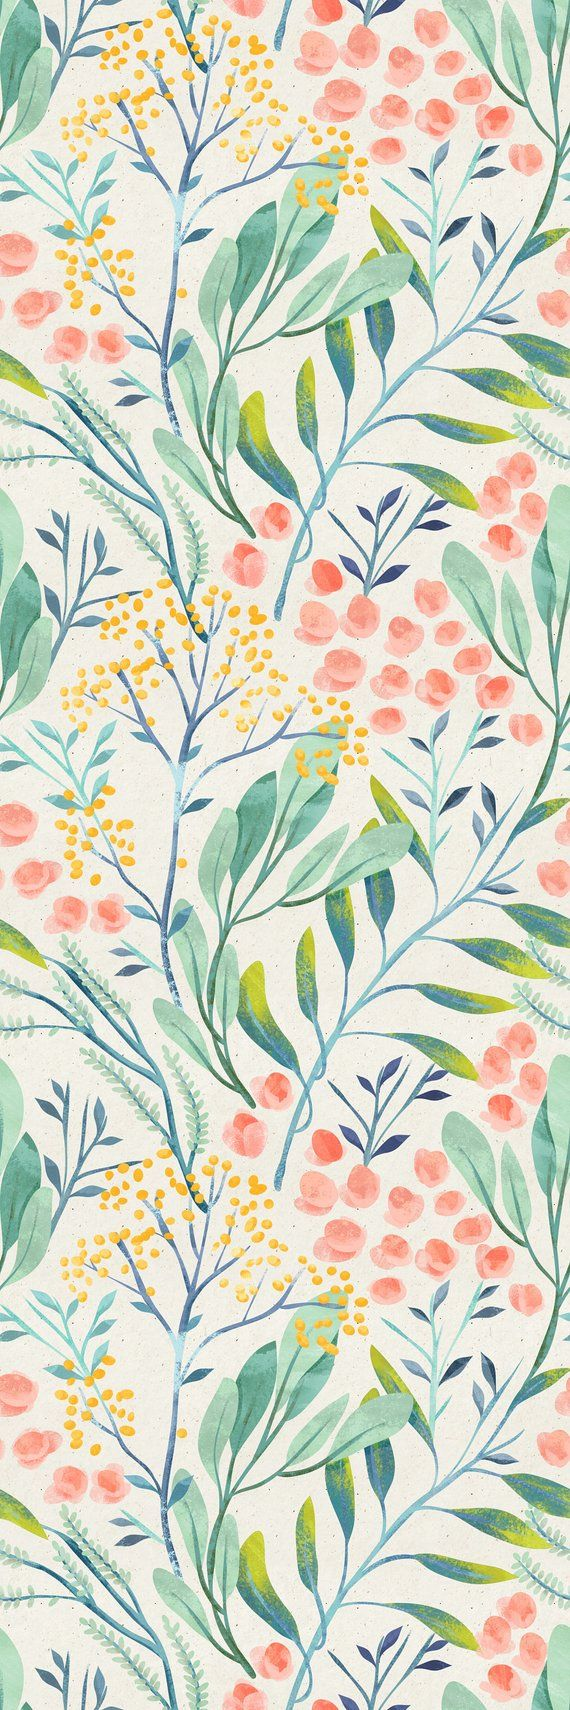 Removable Wallpaper Self Adhesive Wallpaper Watercolor Wild | Etsy